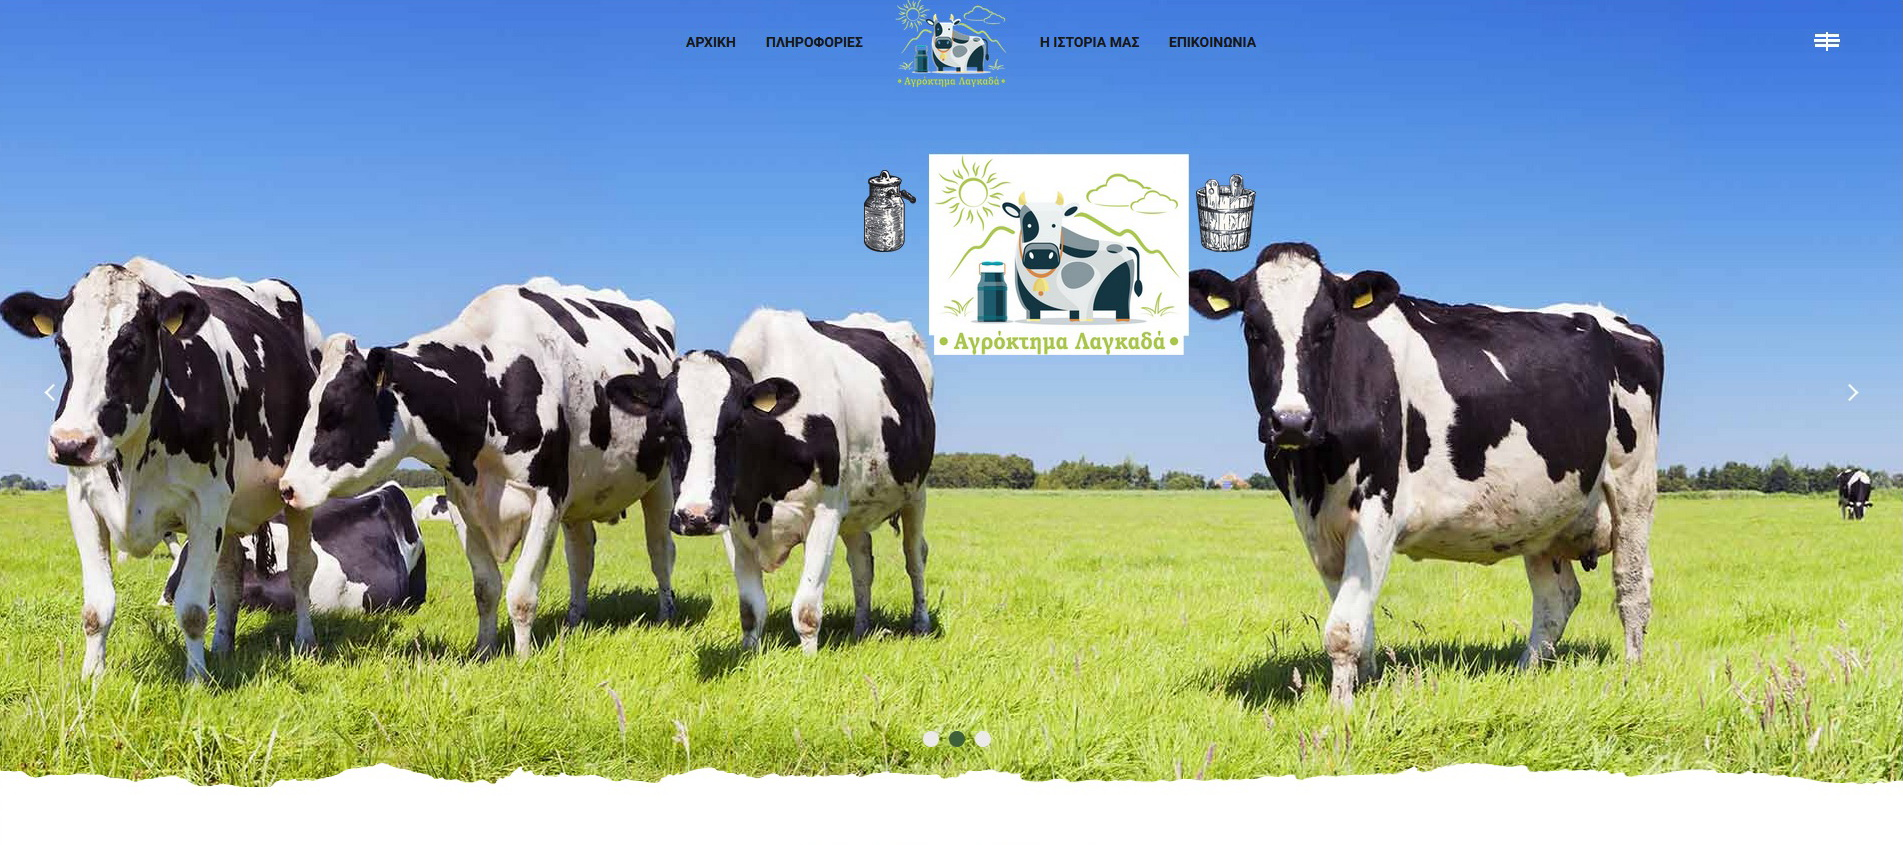 agroktimalagada.gr – Νέα Ιστοσελίδα παρουσίασης φάρμας από τη VisionCA